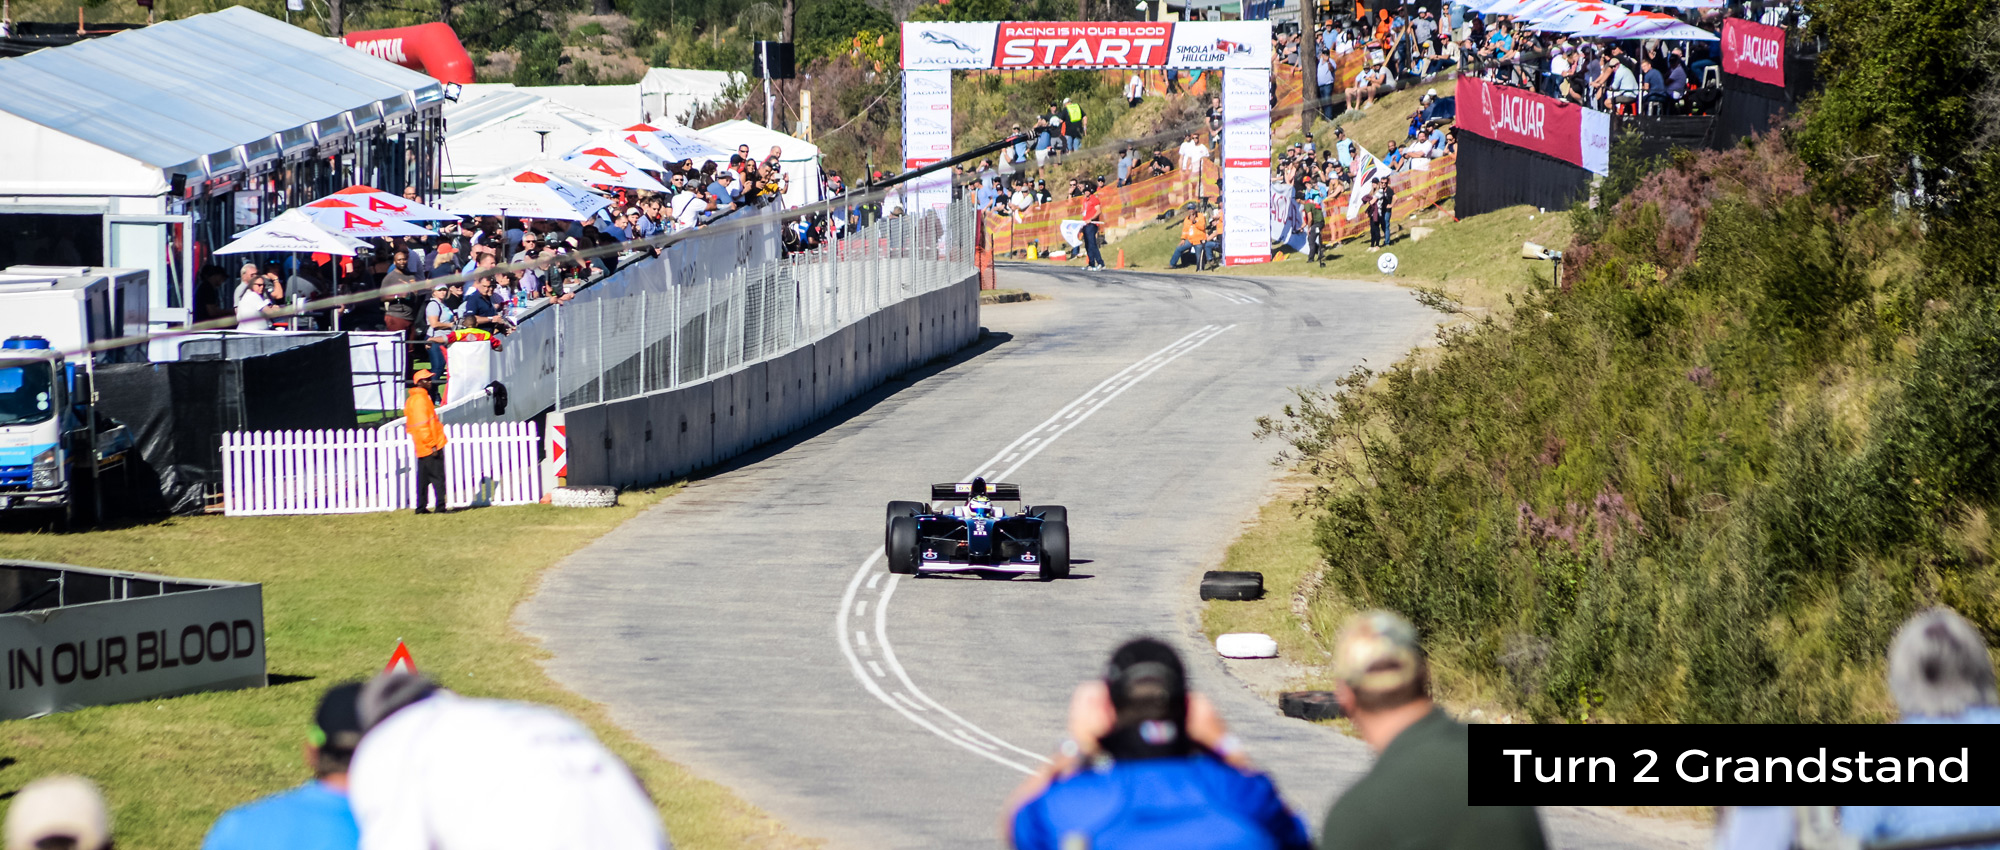 Turn 2 Grandstand, Jaguar Simola Hillclimb